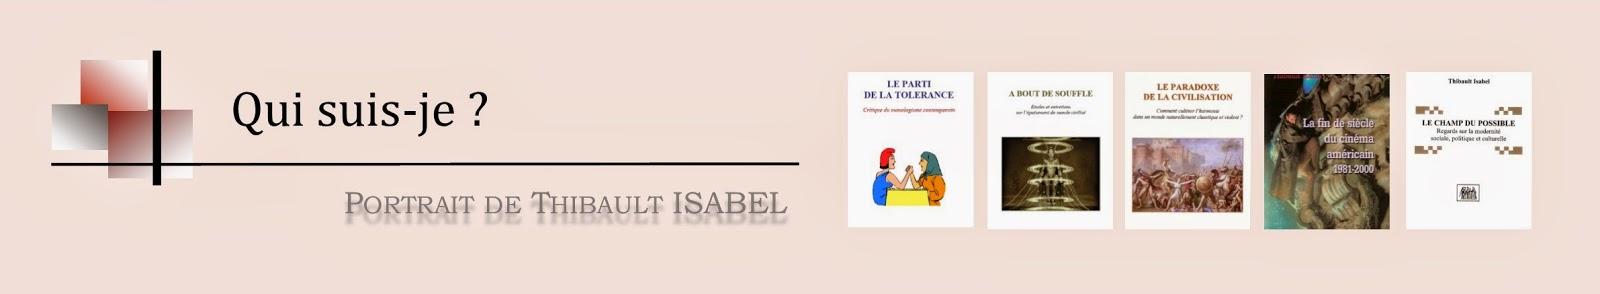 livres de Thibault Isabel